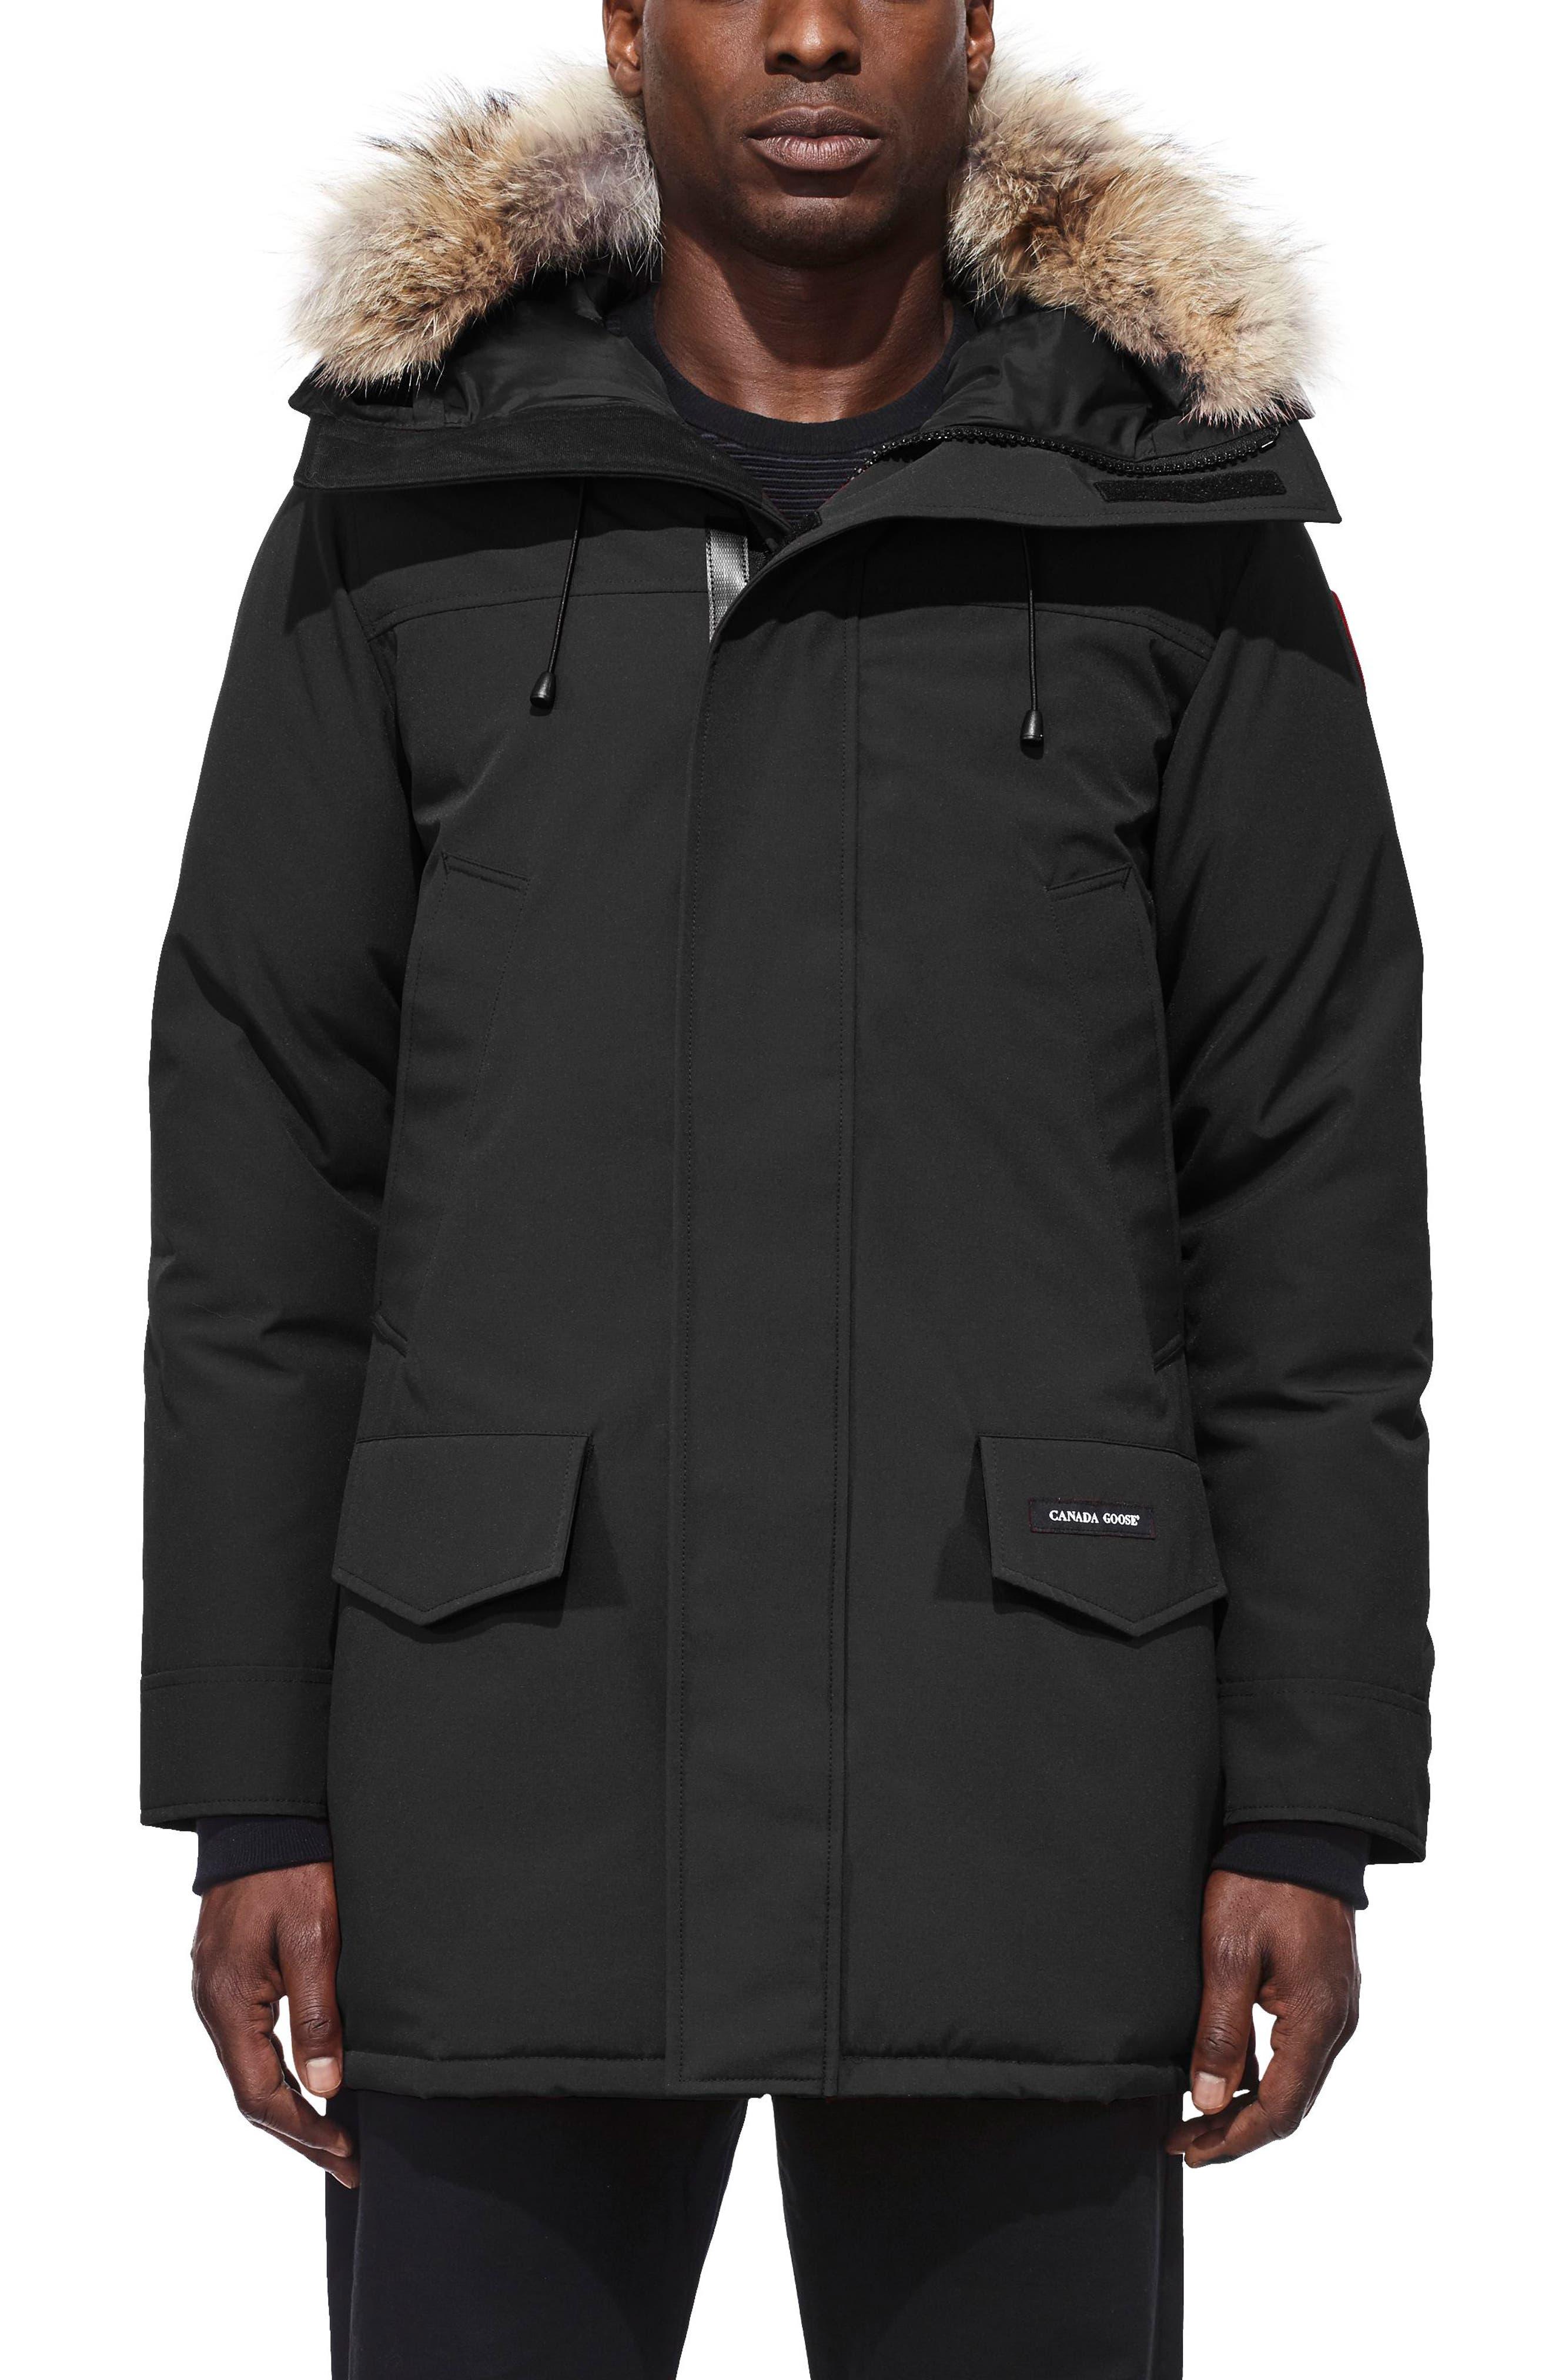 CANADA GOOSE, Langford Slim Fit Down Parka with Genuine Coyote Fur Trim, Main thumbnail 1, color, BLACK